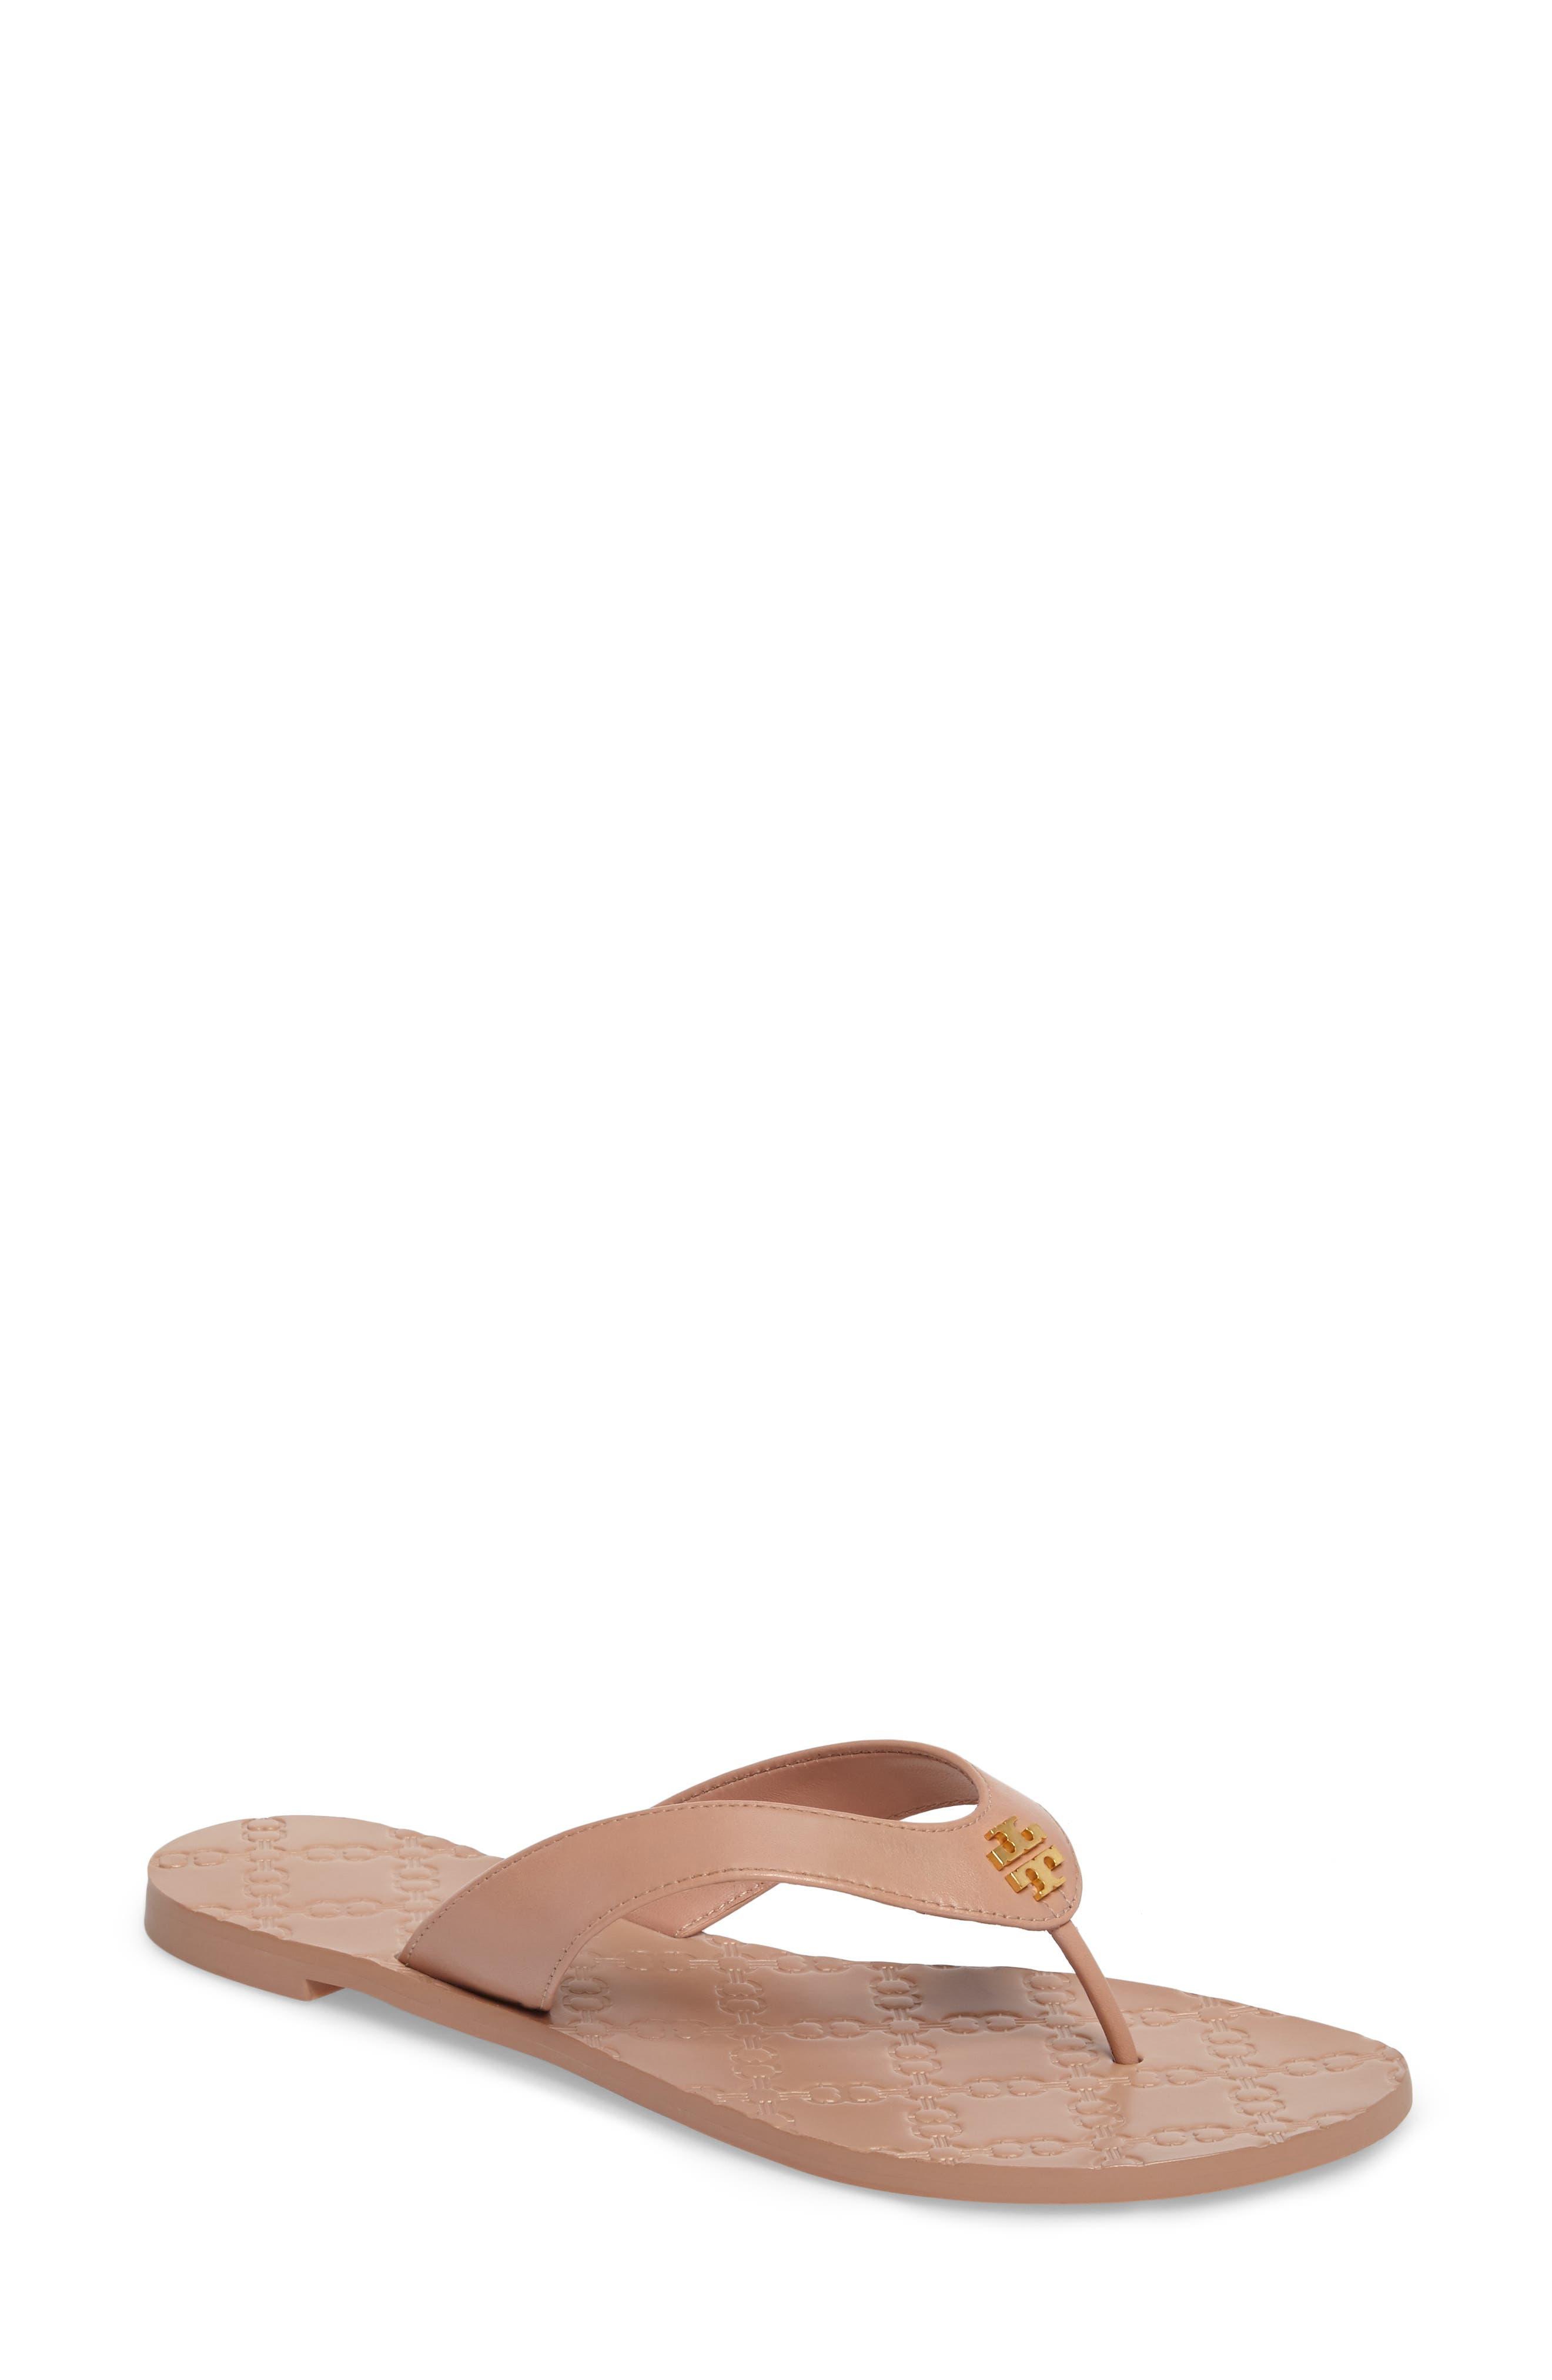 Women's Sandals, Tory Burch Sandals, Women's Sandals for Women   Nordstrom 141528